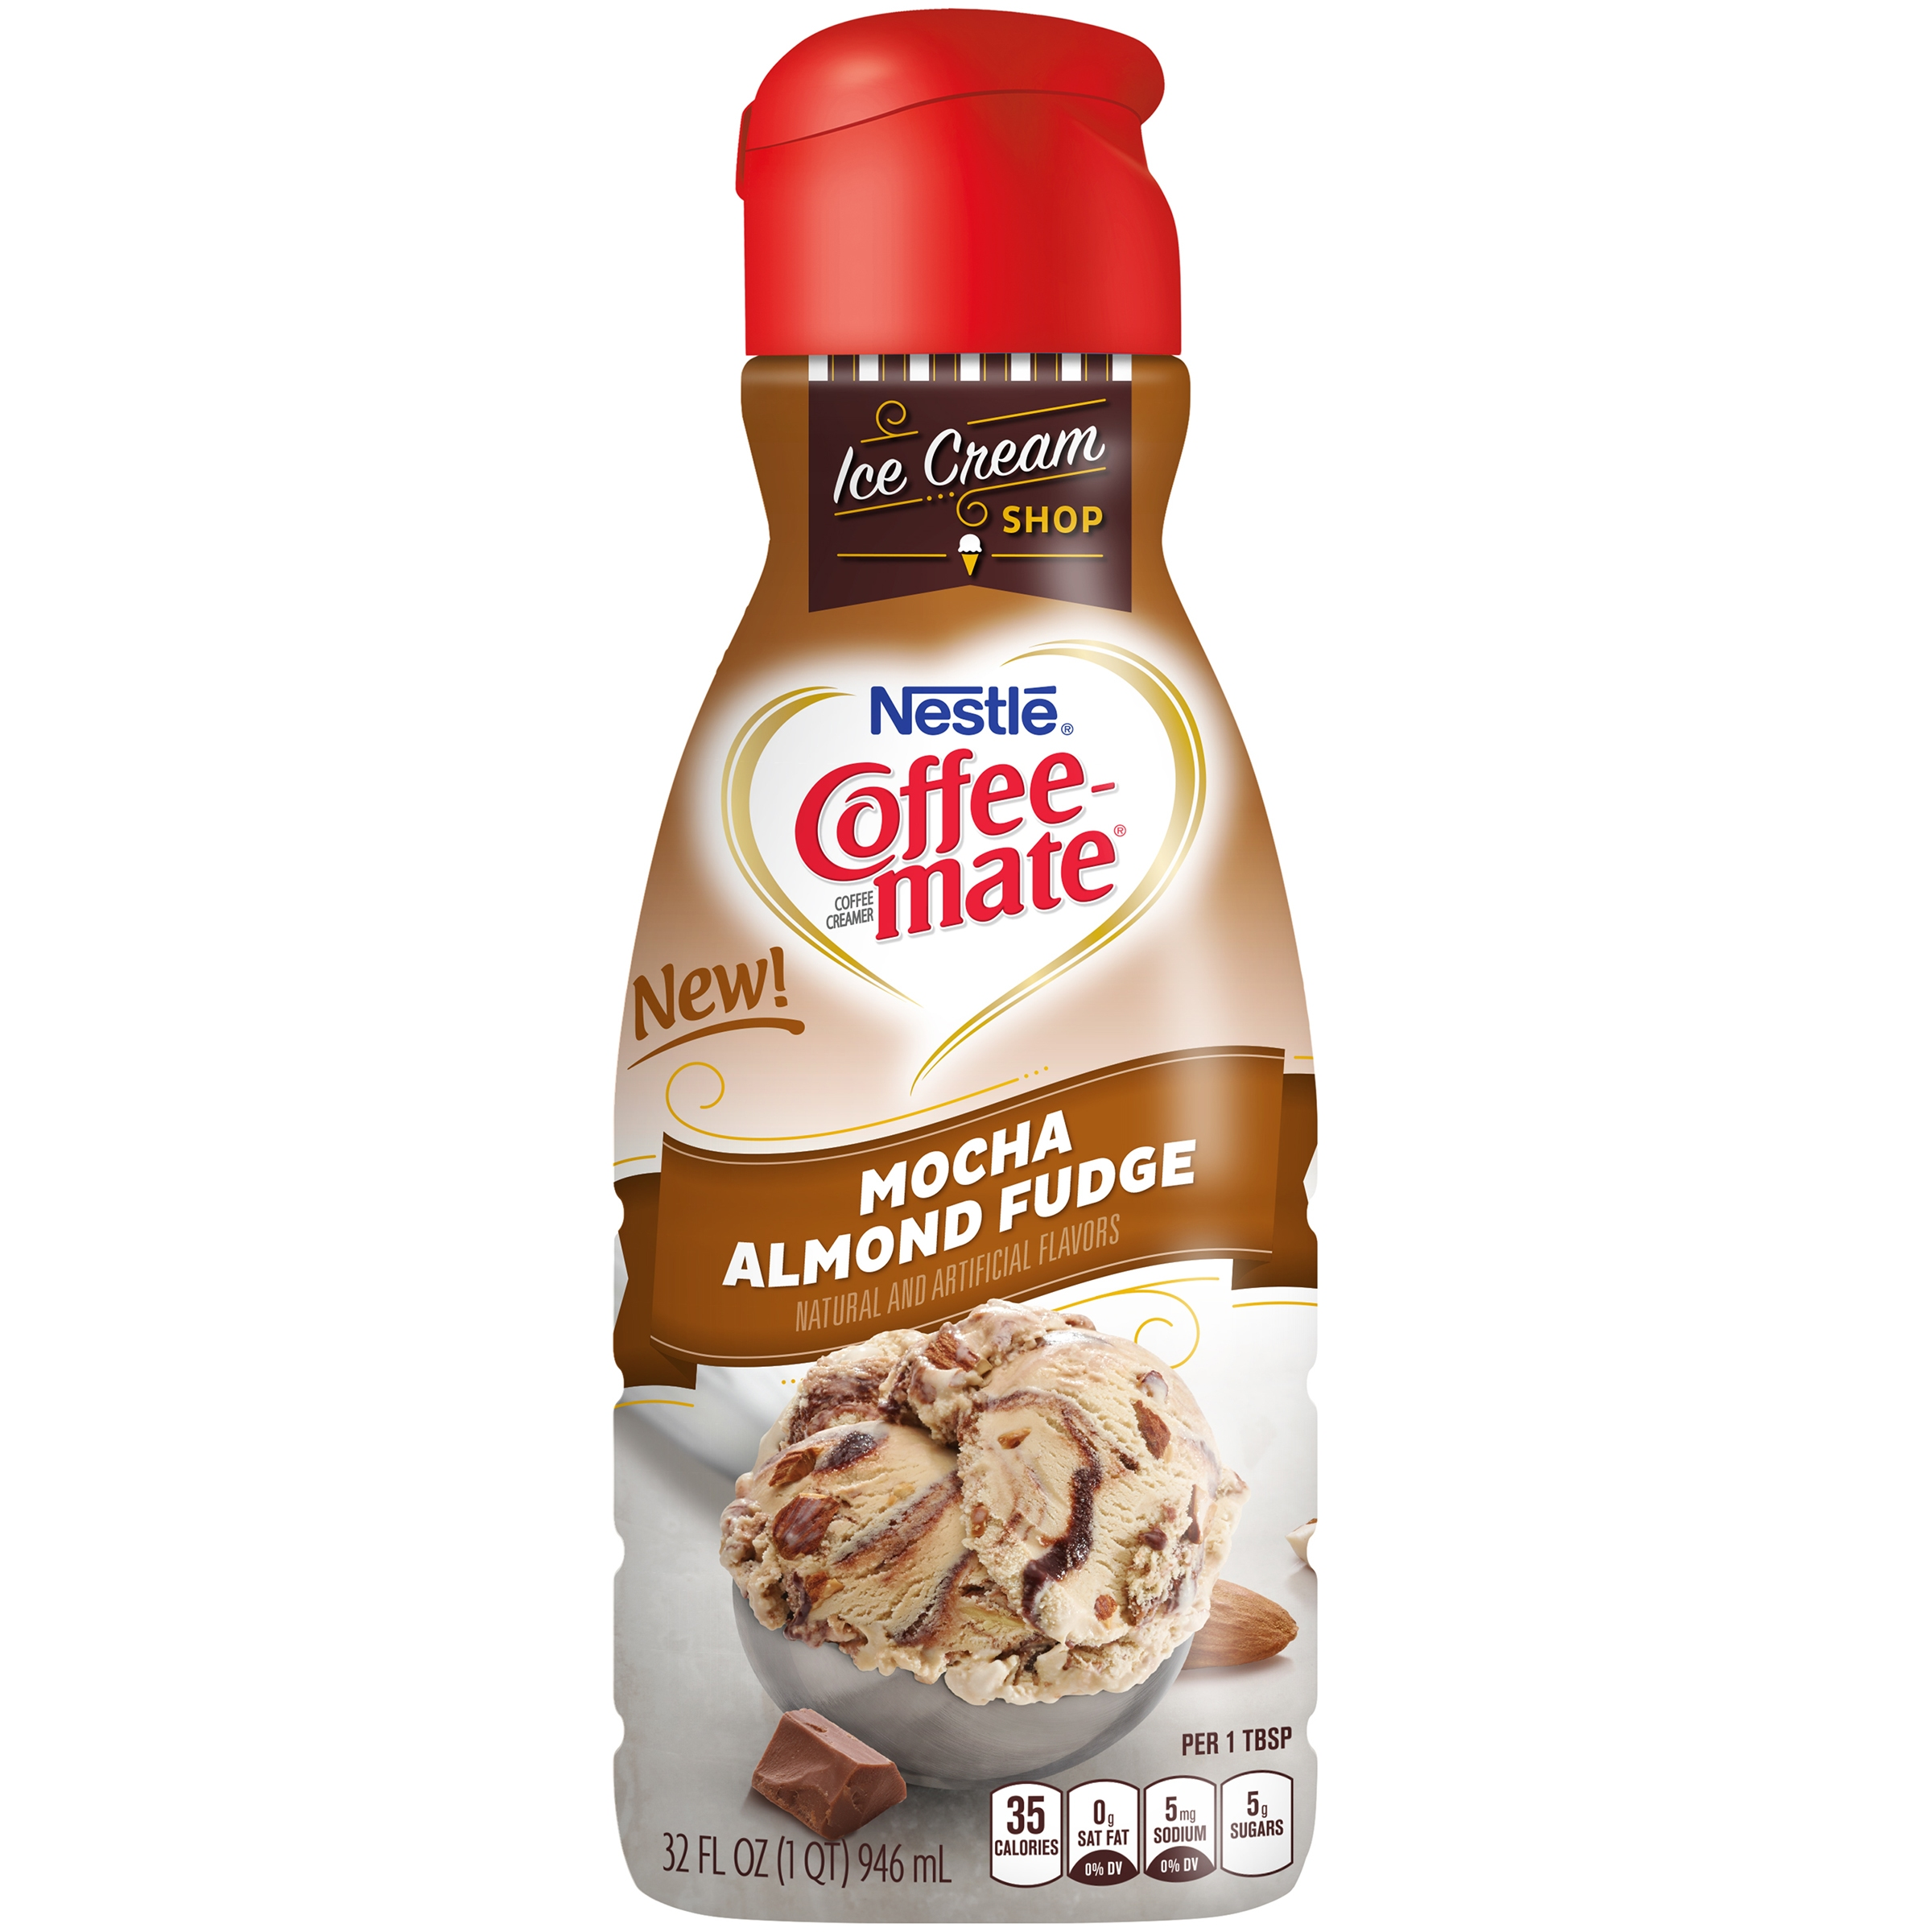 Nestle Coffeemate Mocha Almond Fudge Liquid Coffee Creamer 32 fl oz ...